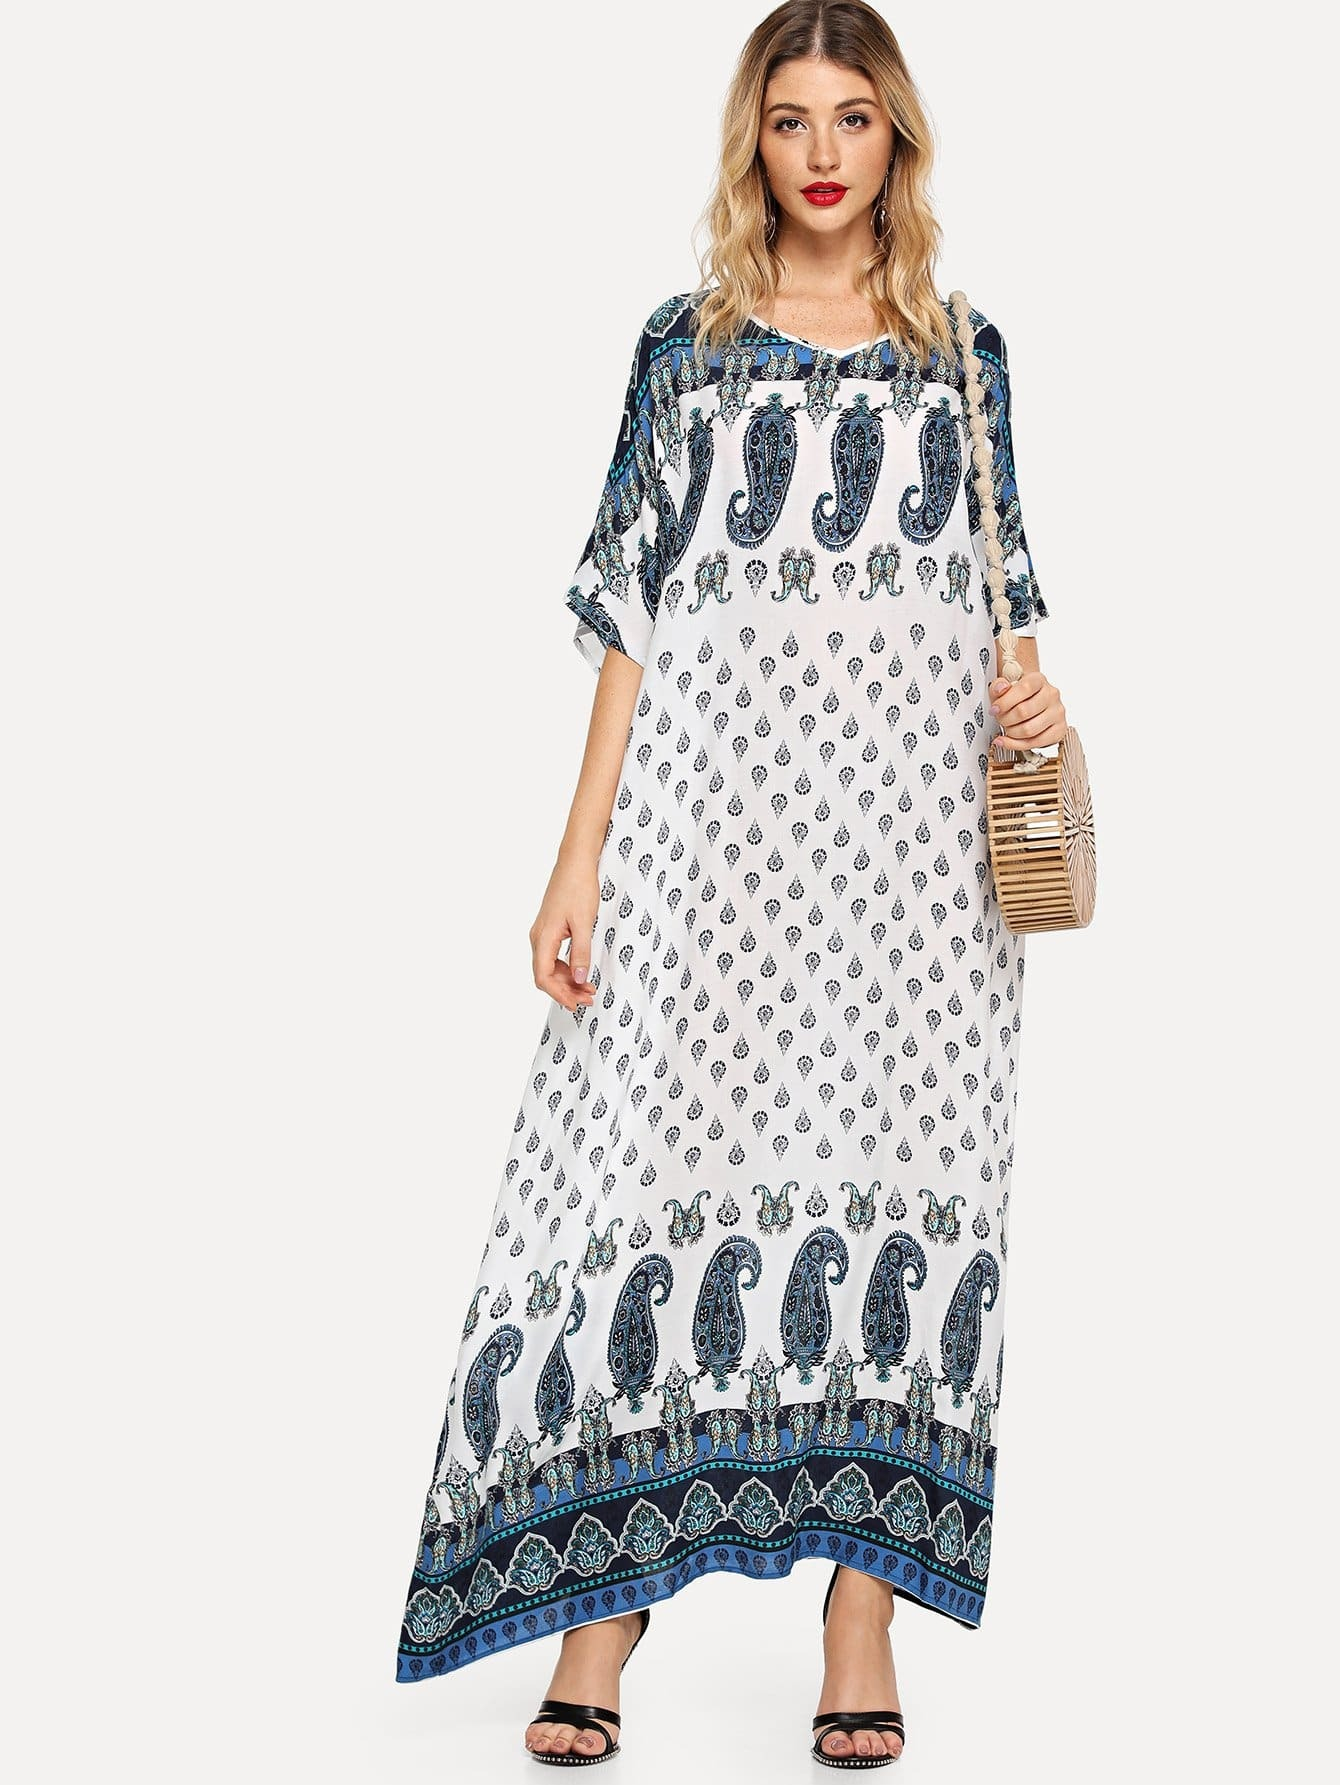 Купить Allover Paisley Версия для печати Batwing Sleeve Hijab Dress, Nathane, SheIn